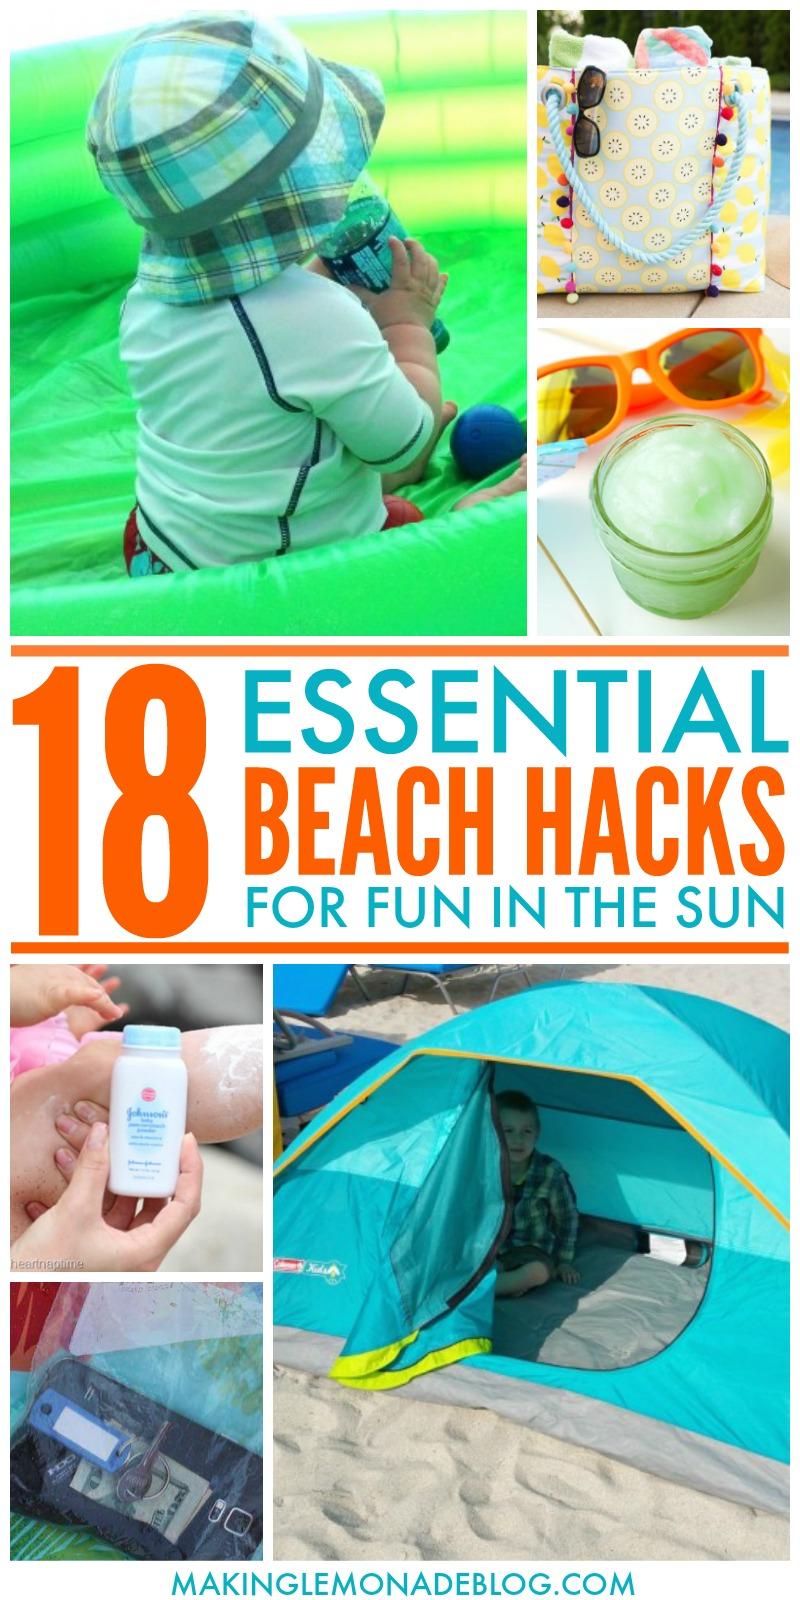 18 Helpful Beach Hacks For Fun In The Sun Making Lemonade